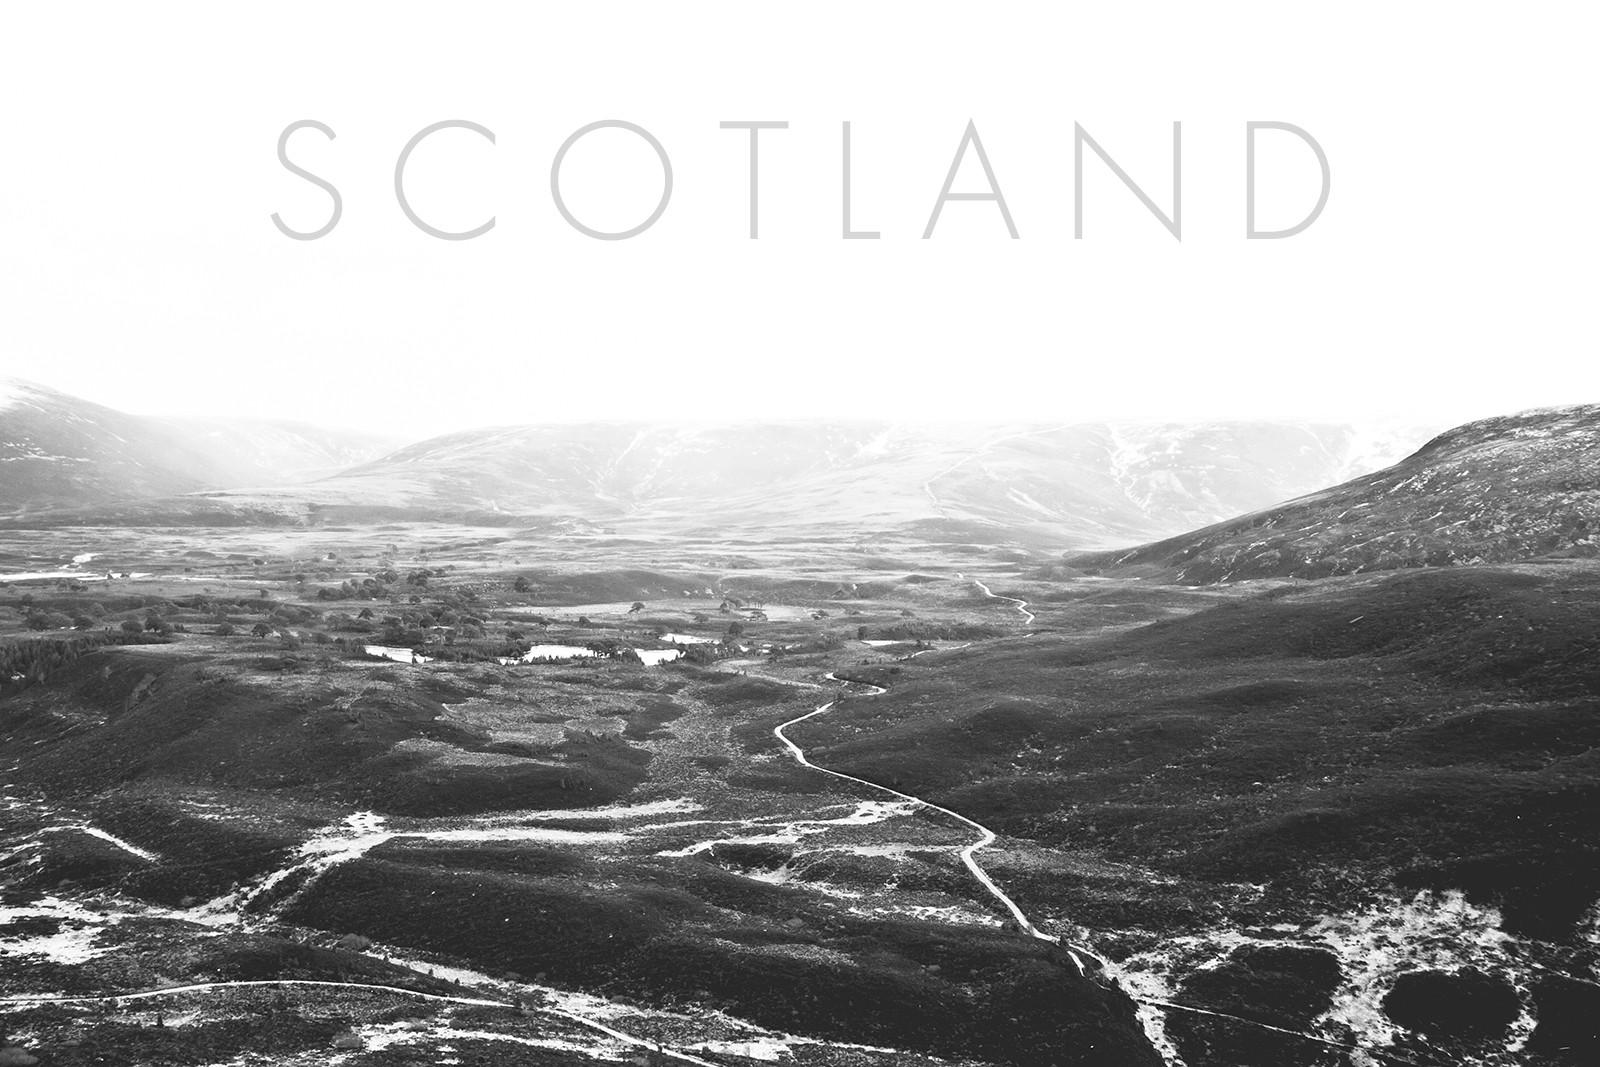 ScotlandTITLE.jpg